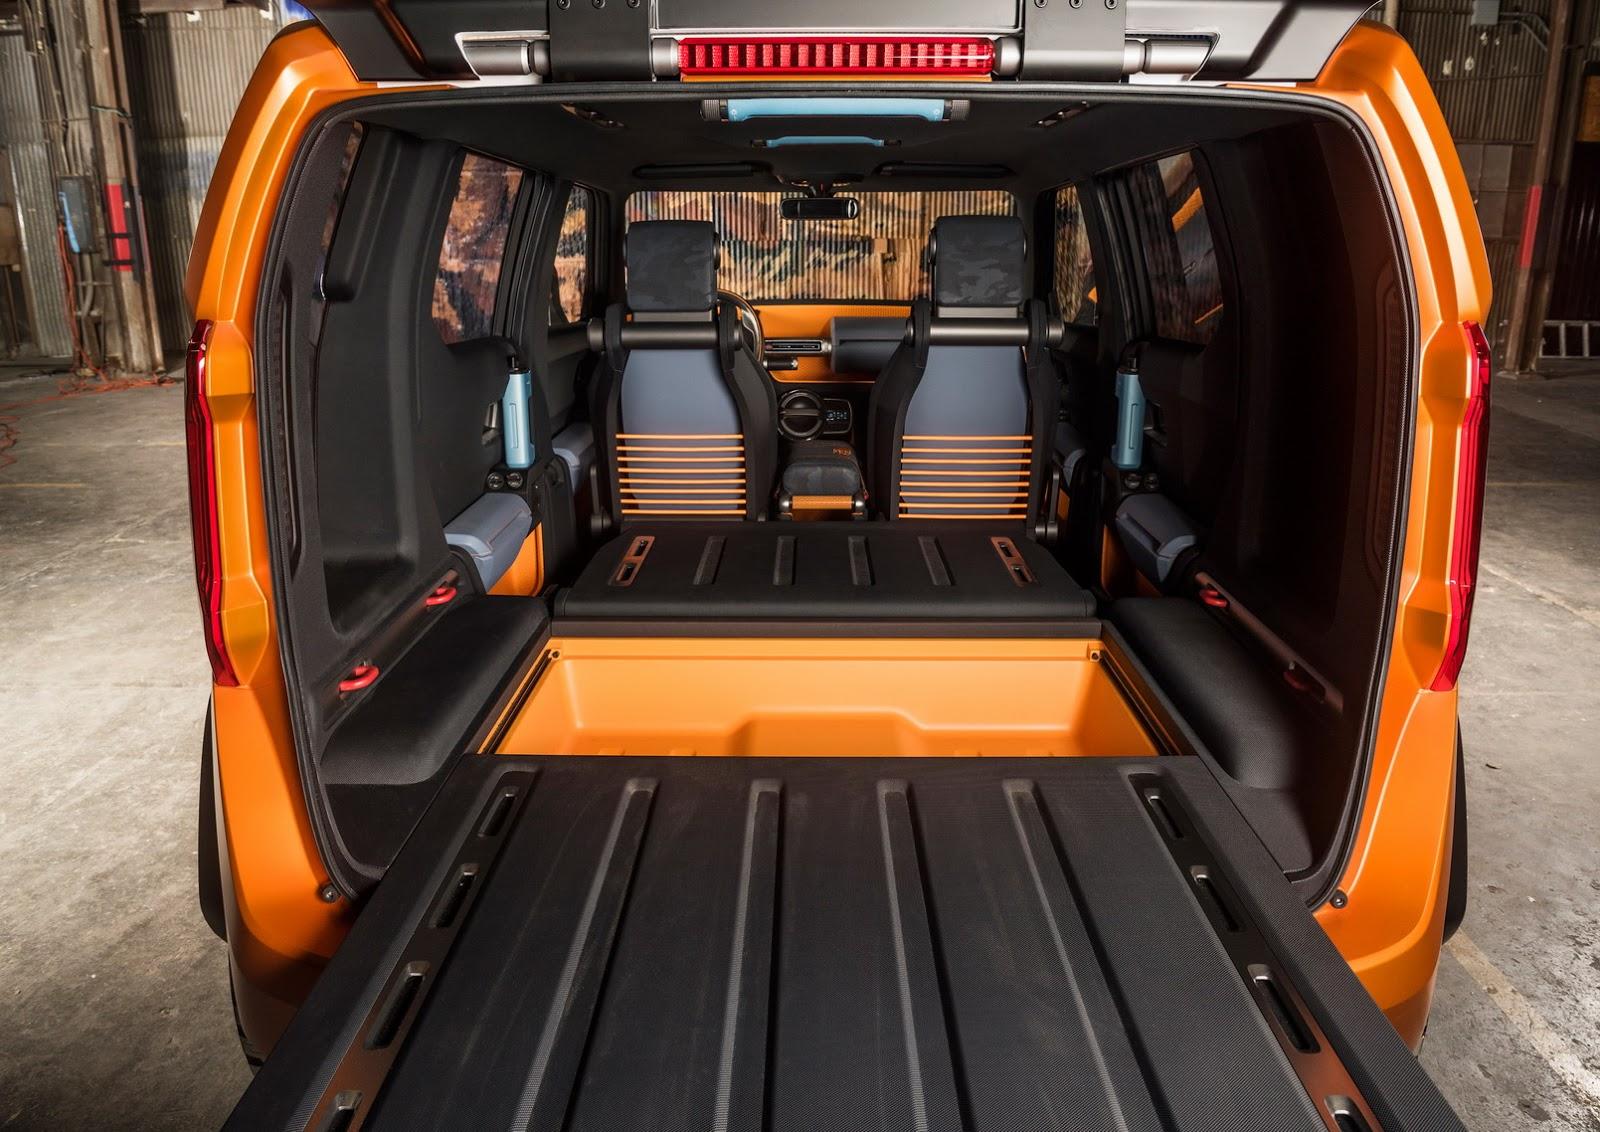 Toyota Ft 4X >> New Toyota Ft 4x Autonetmagz Review Mobil Dan Motor